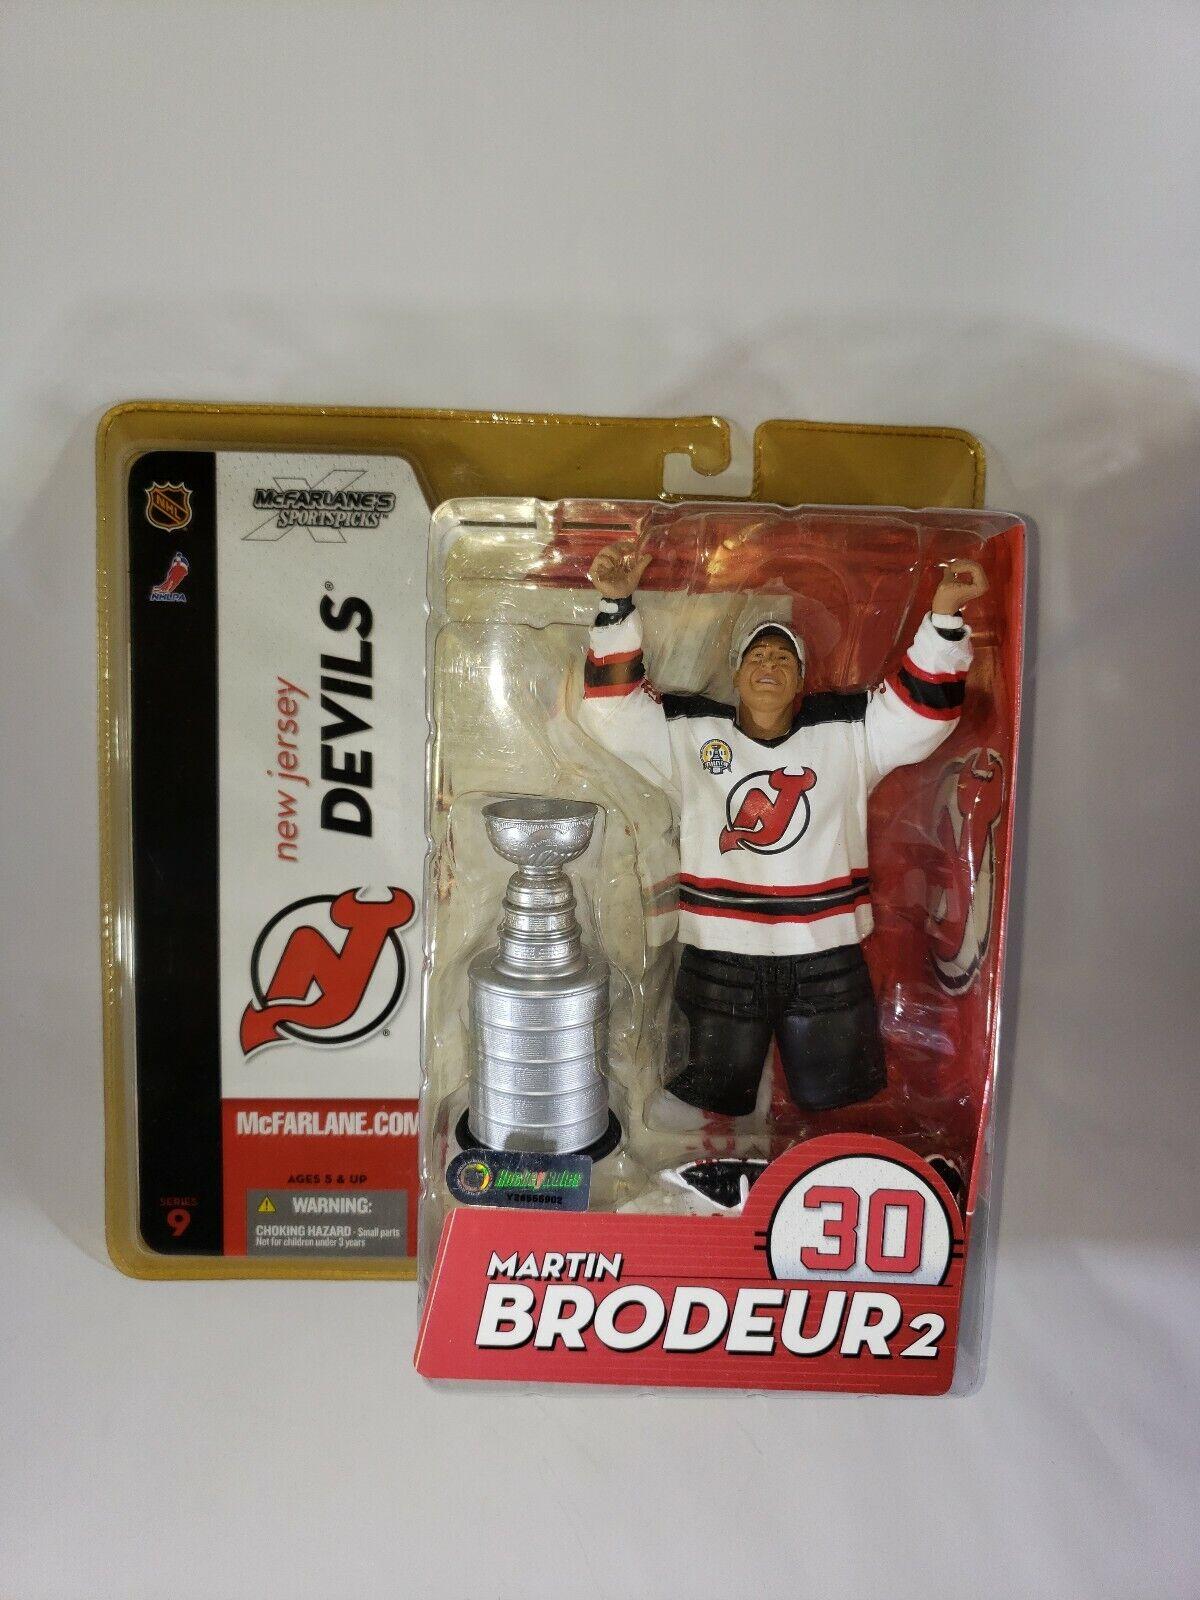 2004 McFarlane NHL Martin Brodeur 2 Action Figure